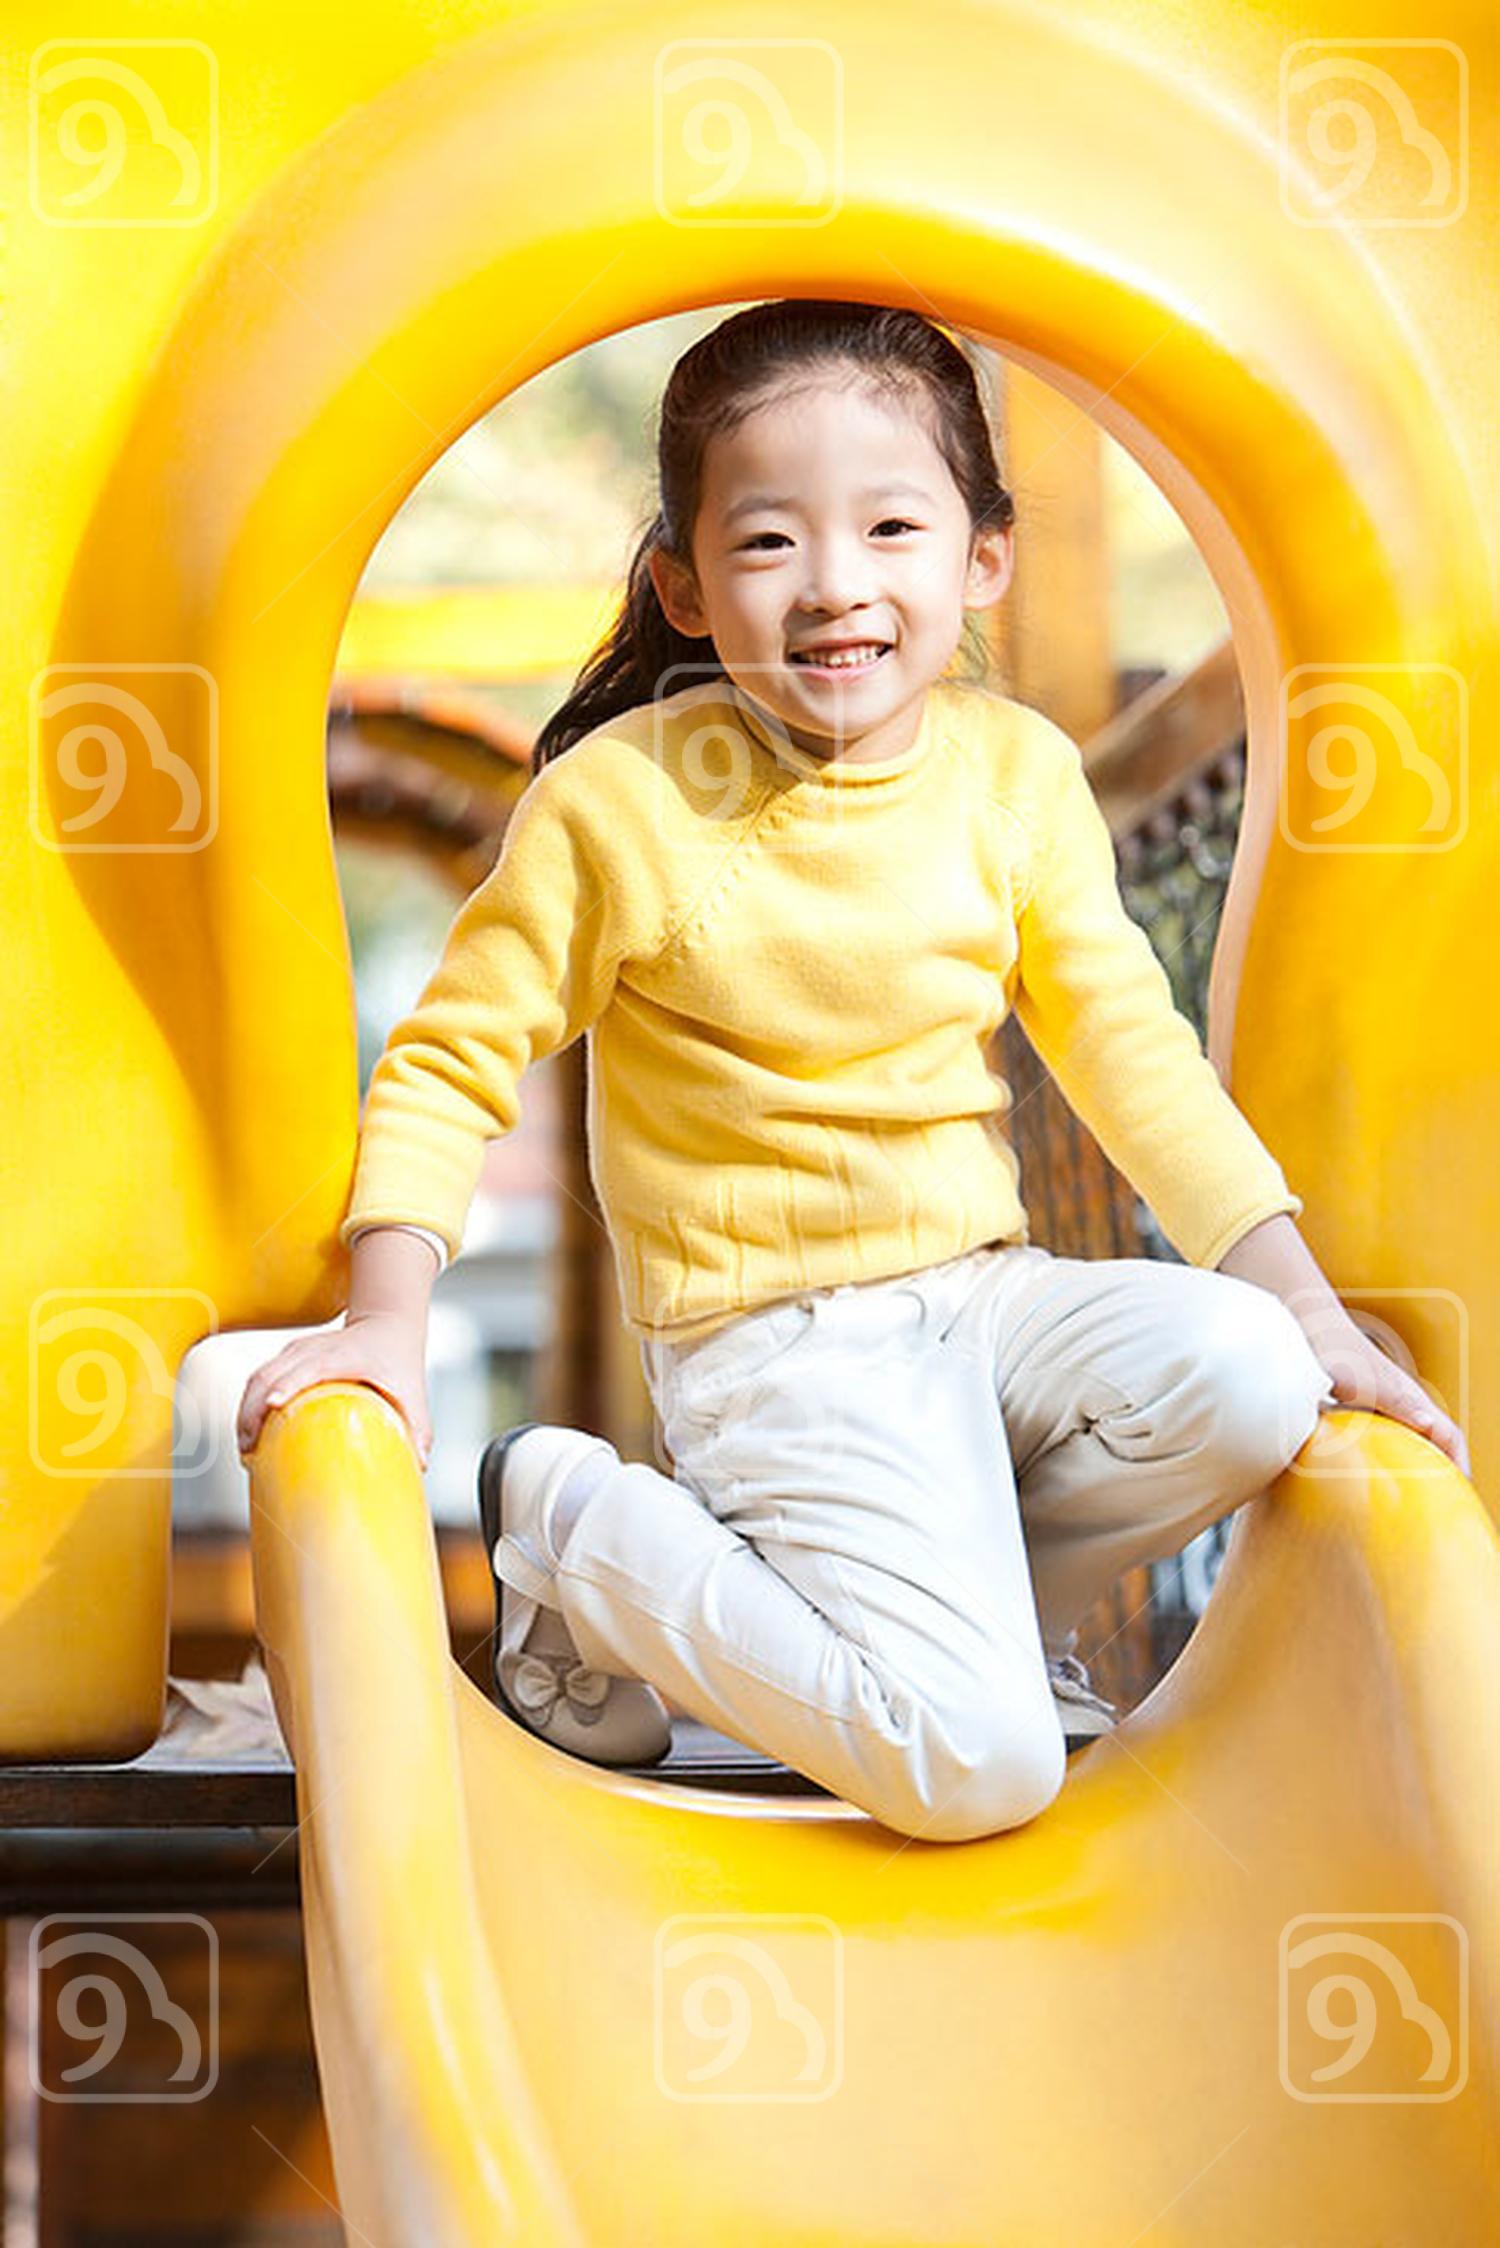 Chinese girl playing on playground slide